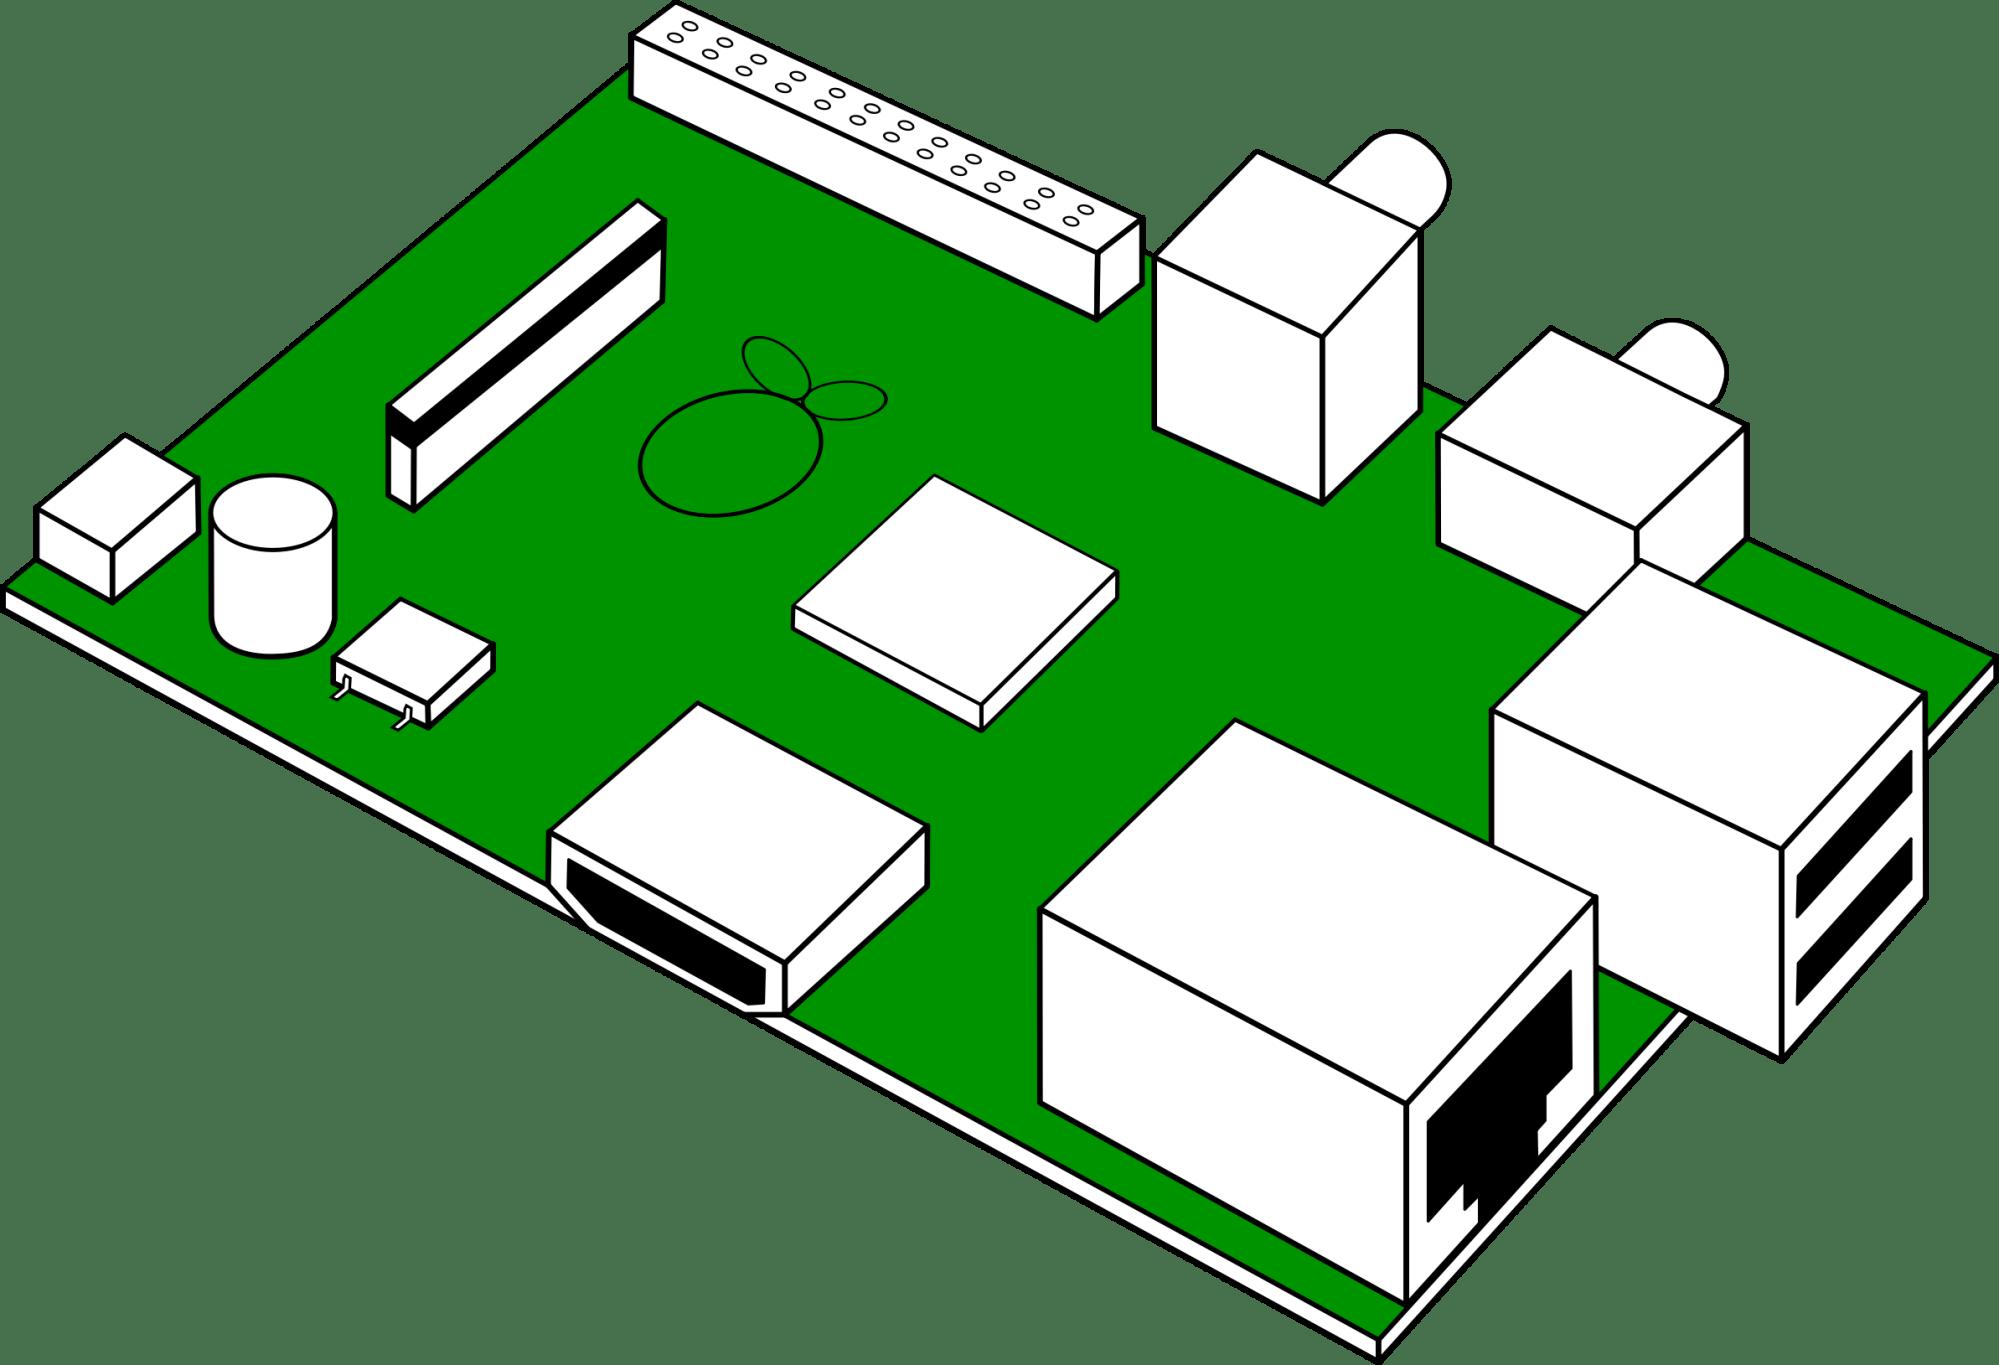 hight resolution of looks like raspberry pi print circuit board clipart